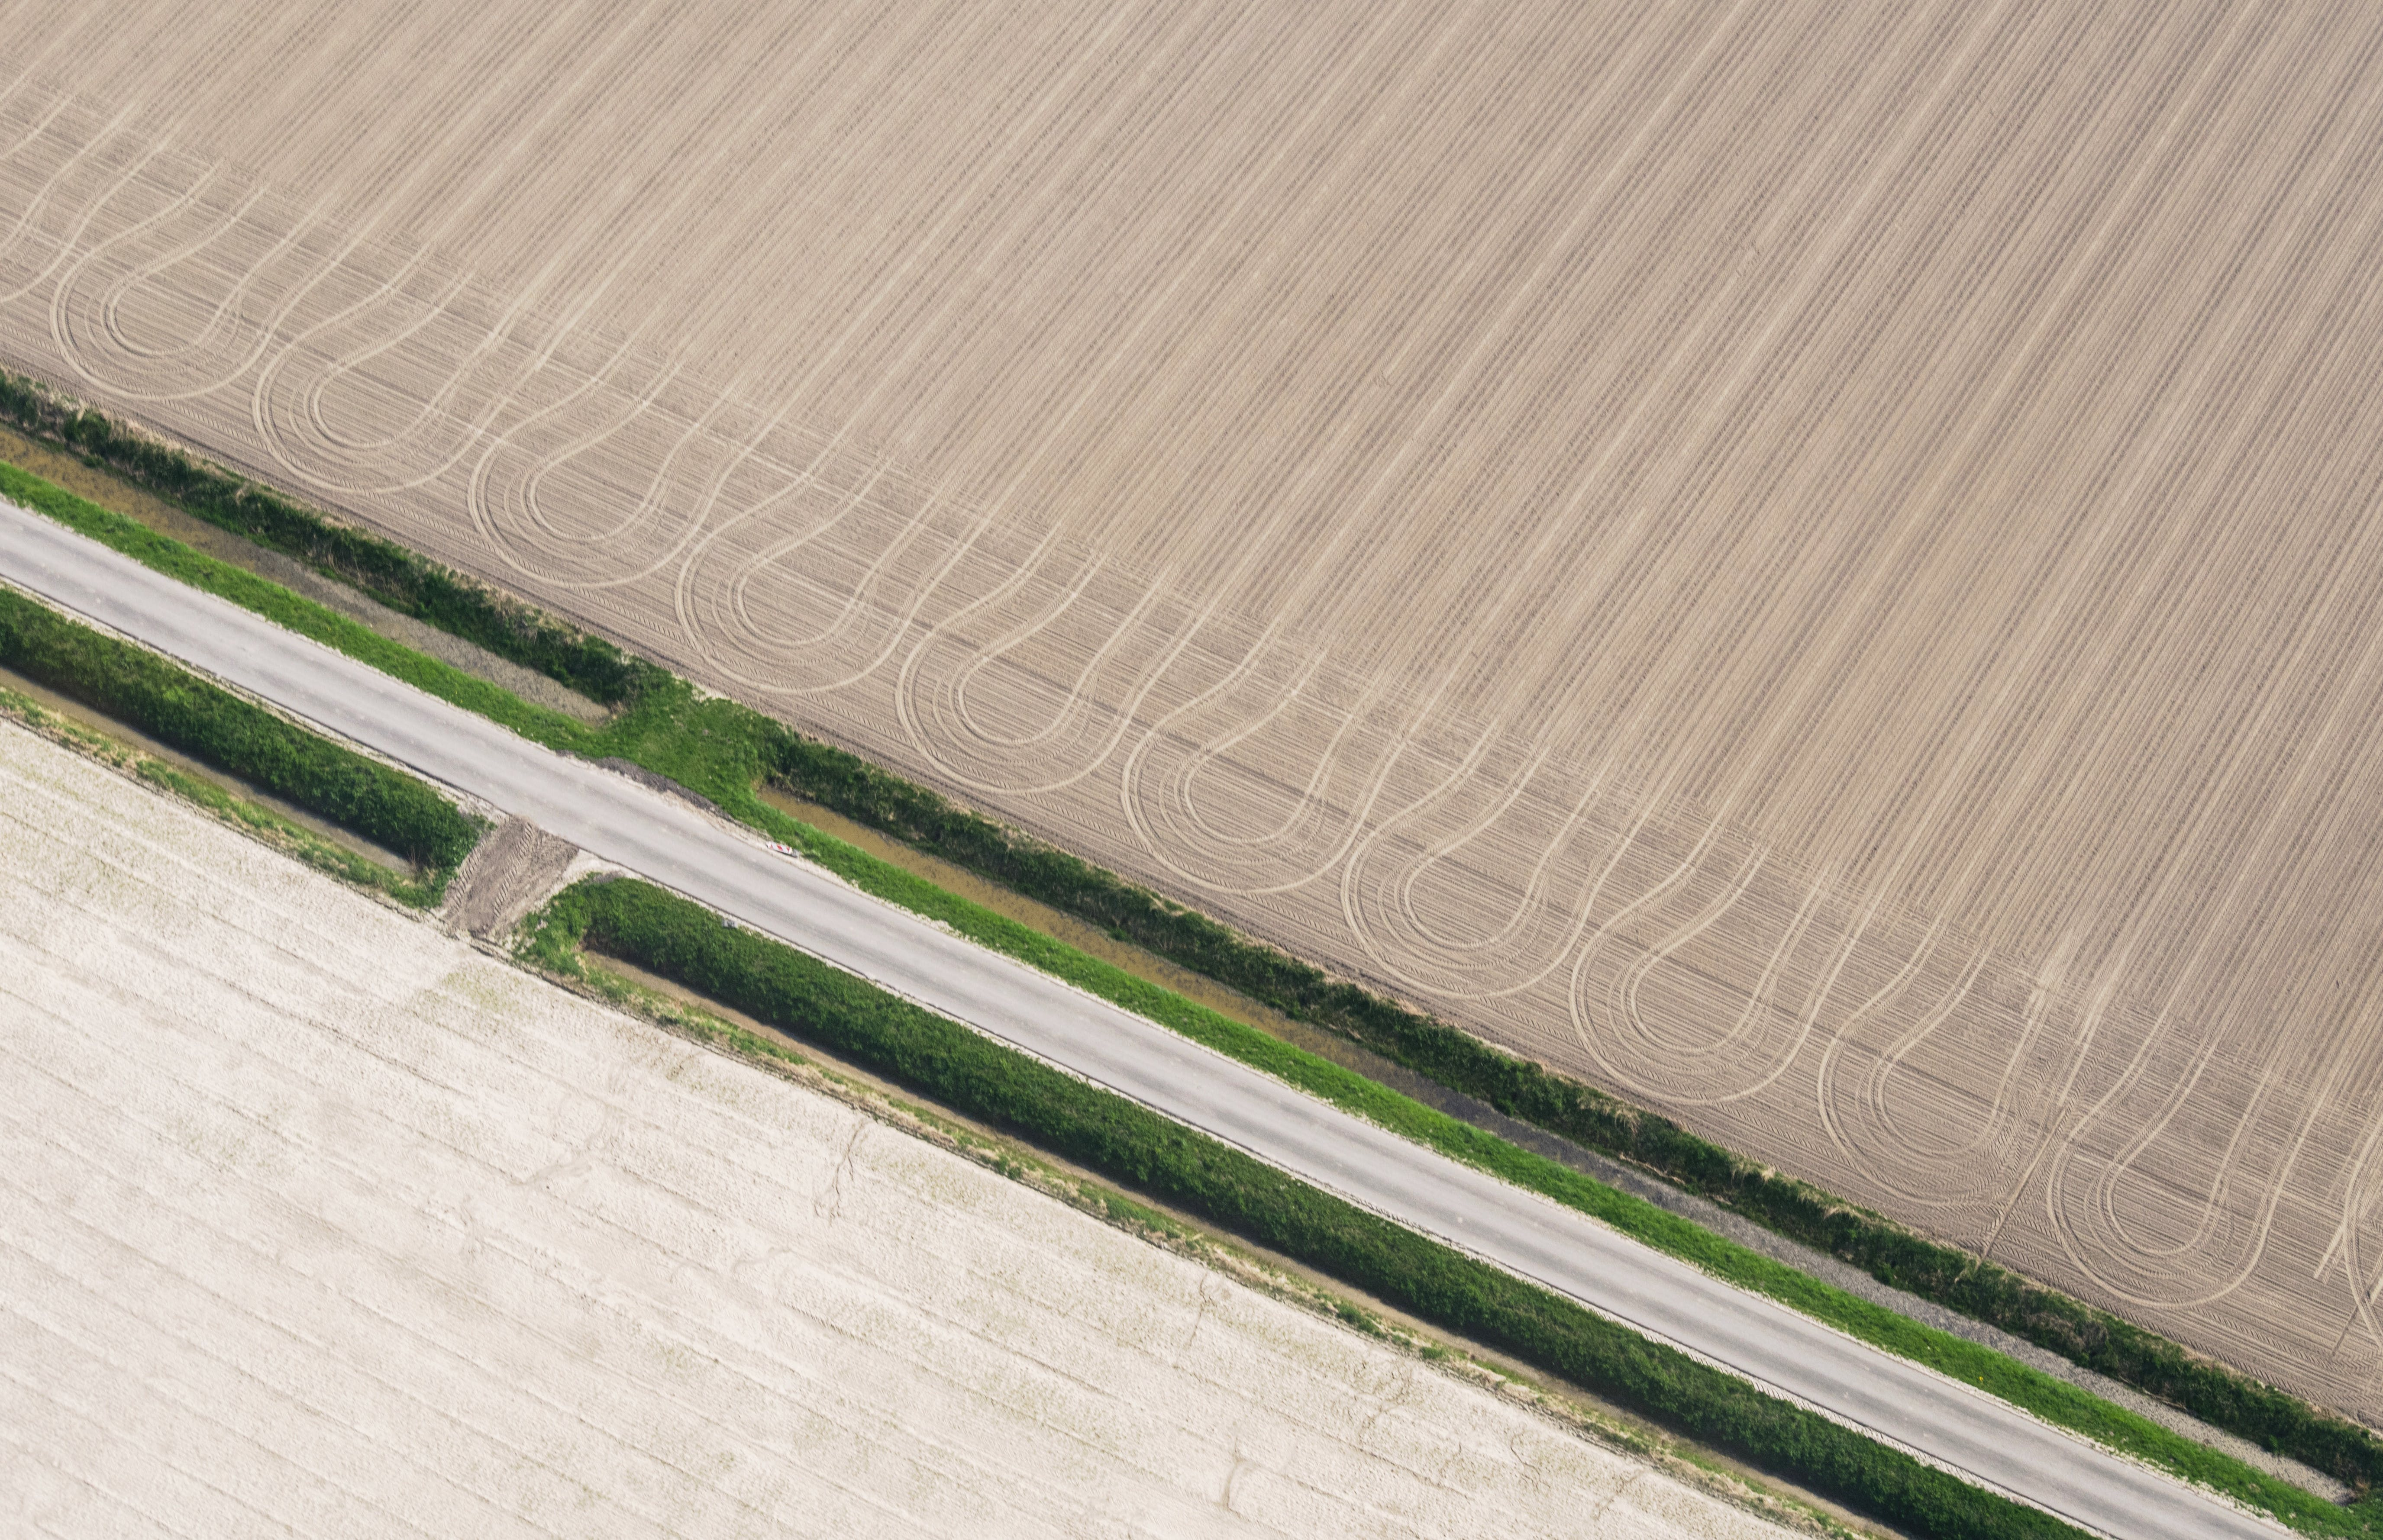 Aerial Photo Of Farm Field